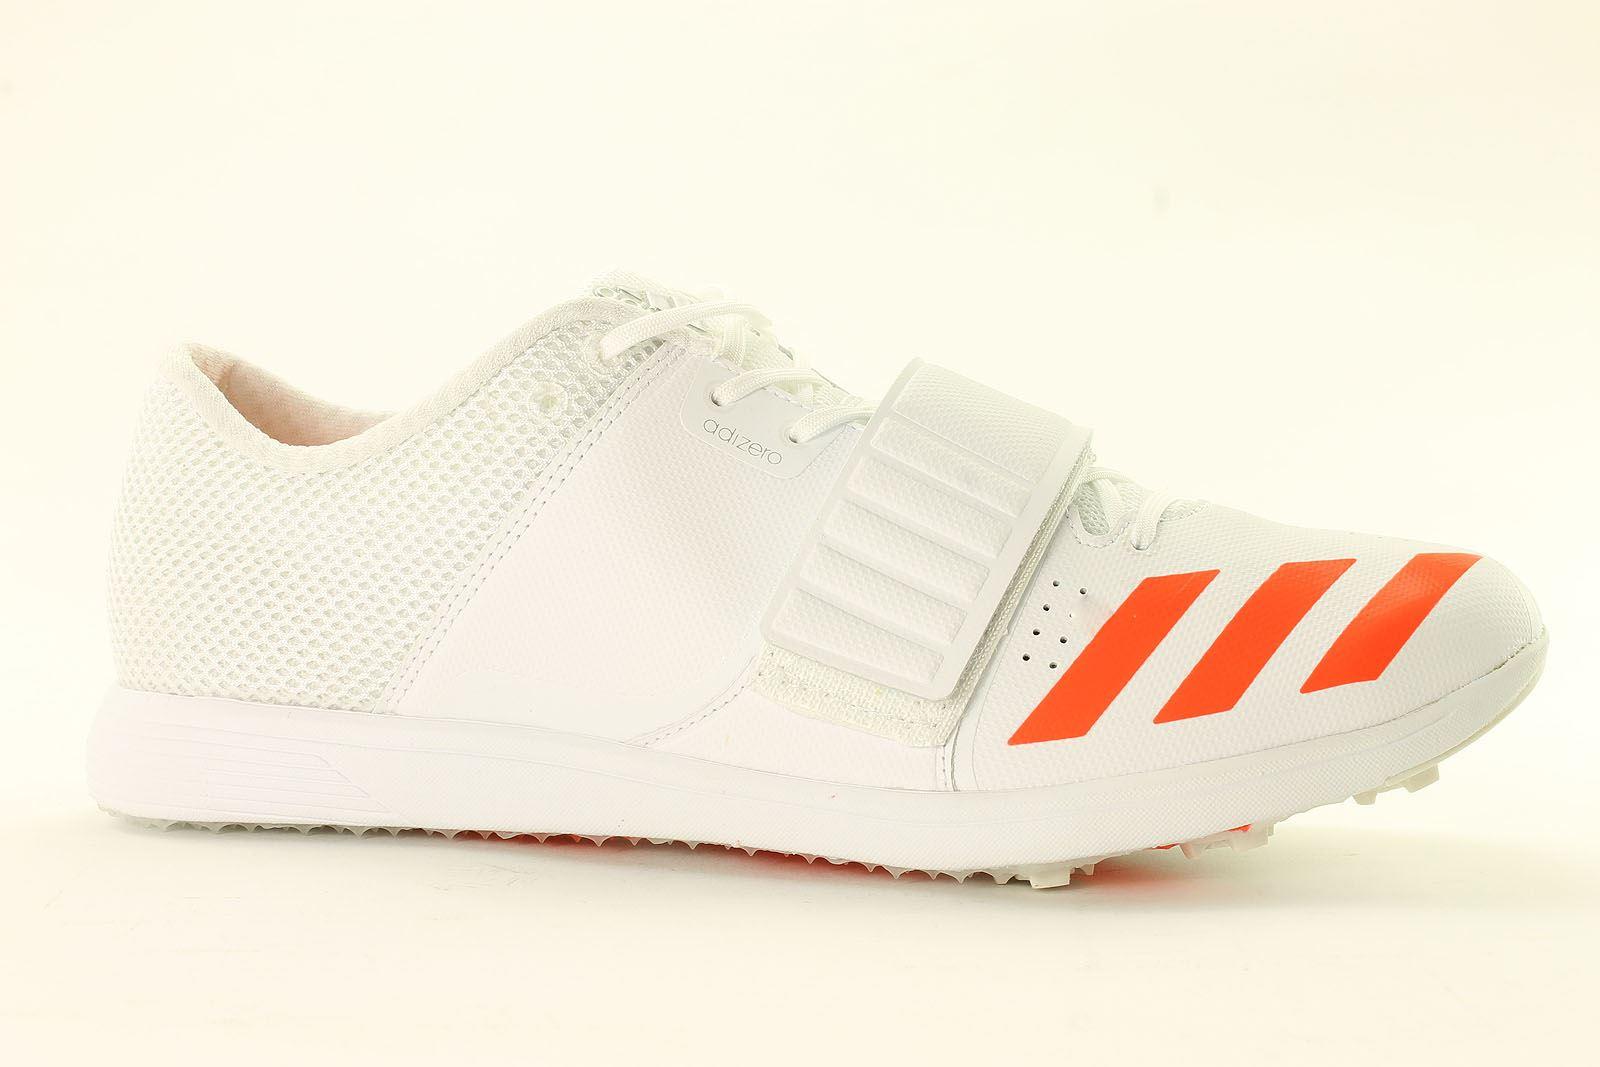 separation shoes efc89 f97b4 ... Adidas-Adizero-Triple-Jump-Pole-Vault-BB4956-Baskets-